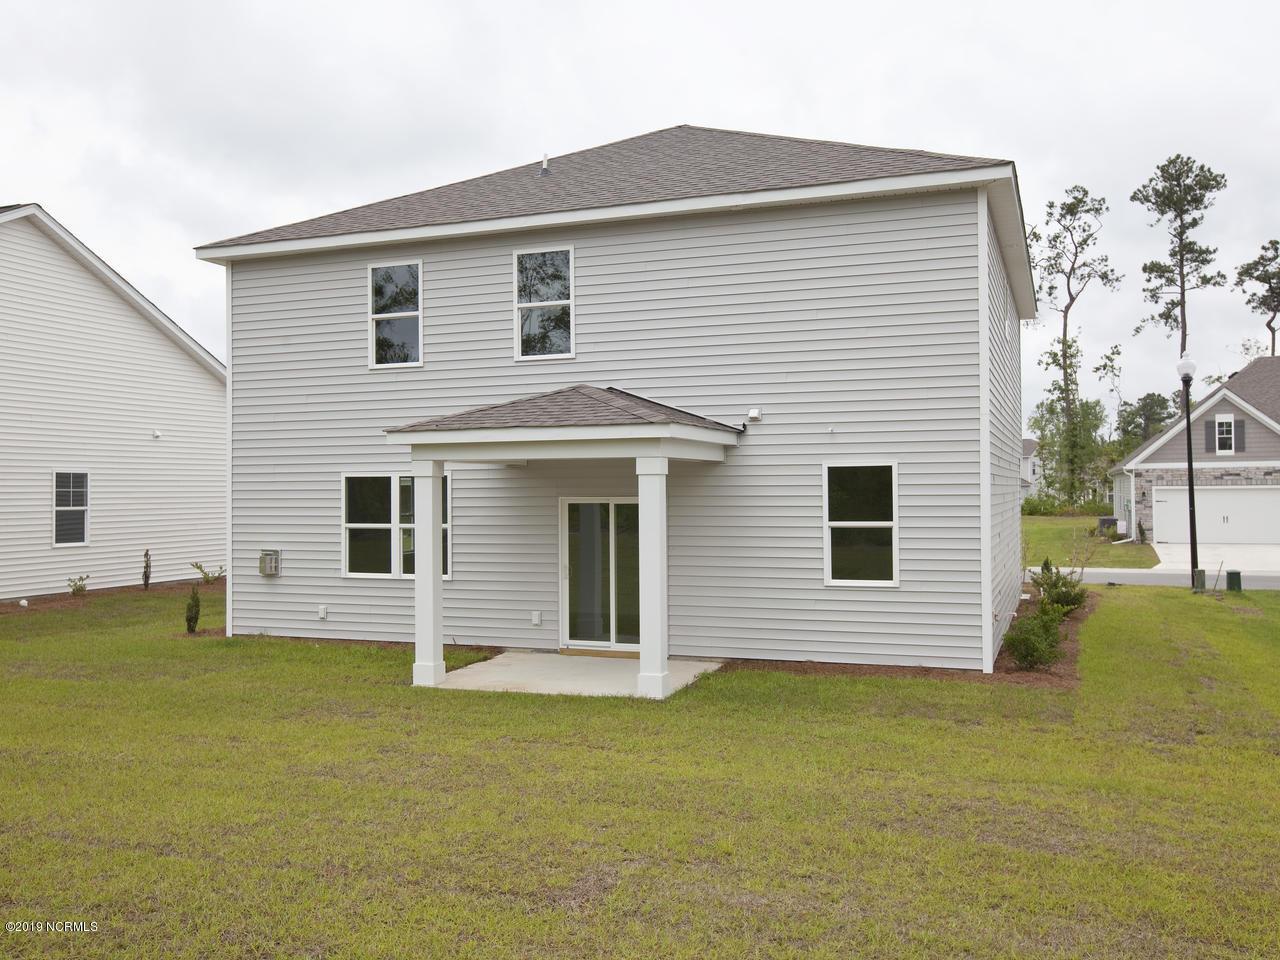 385 Esthwaite Drive #lot 3295 Leland, NC 28451